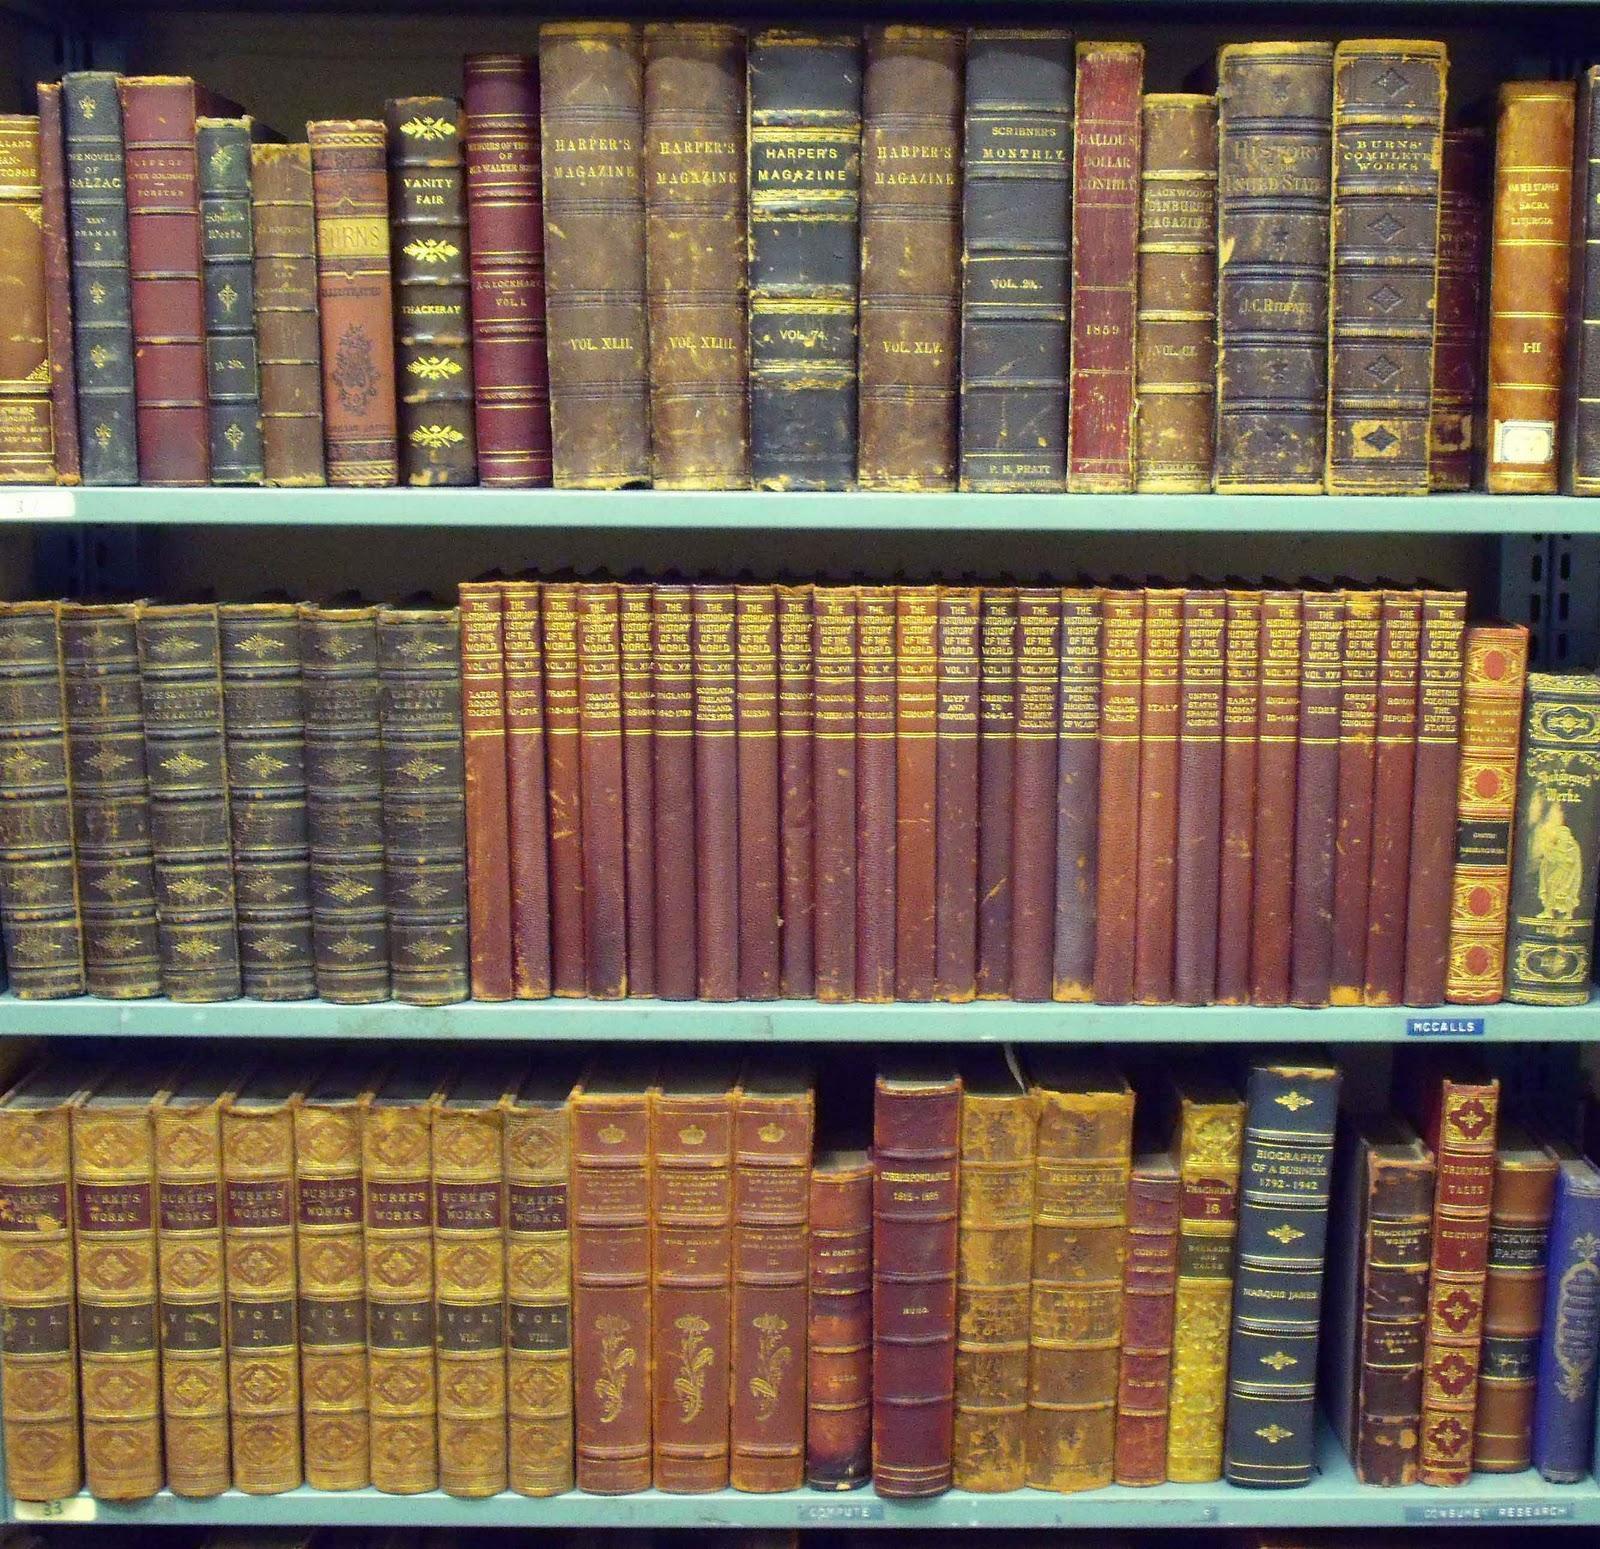 http://2.bp.blogspot.com/_jjgksVeNn3c/TSxMgu1c4oI/AAAAAAAAmic/xG_uIL2XNH8/s1600/books2.jpg